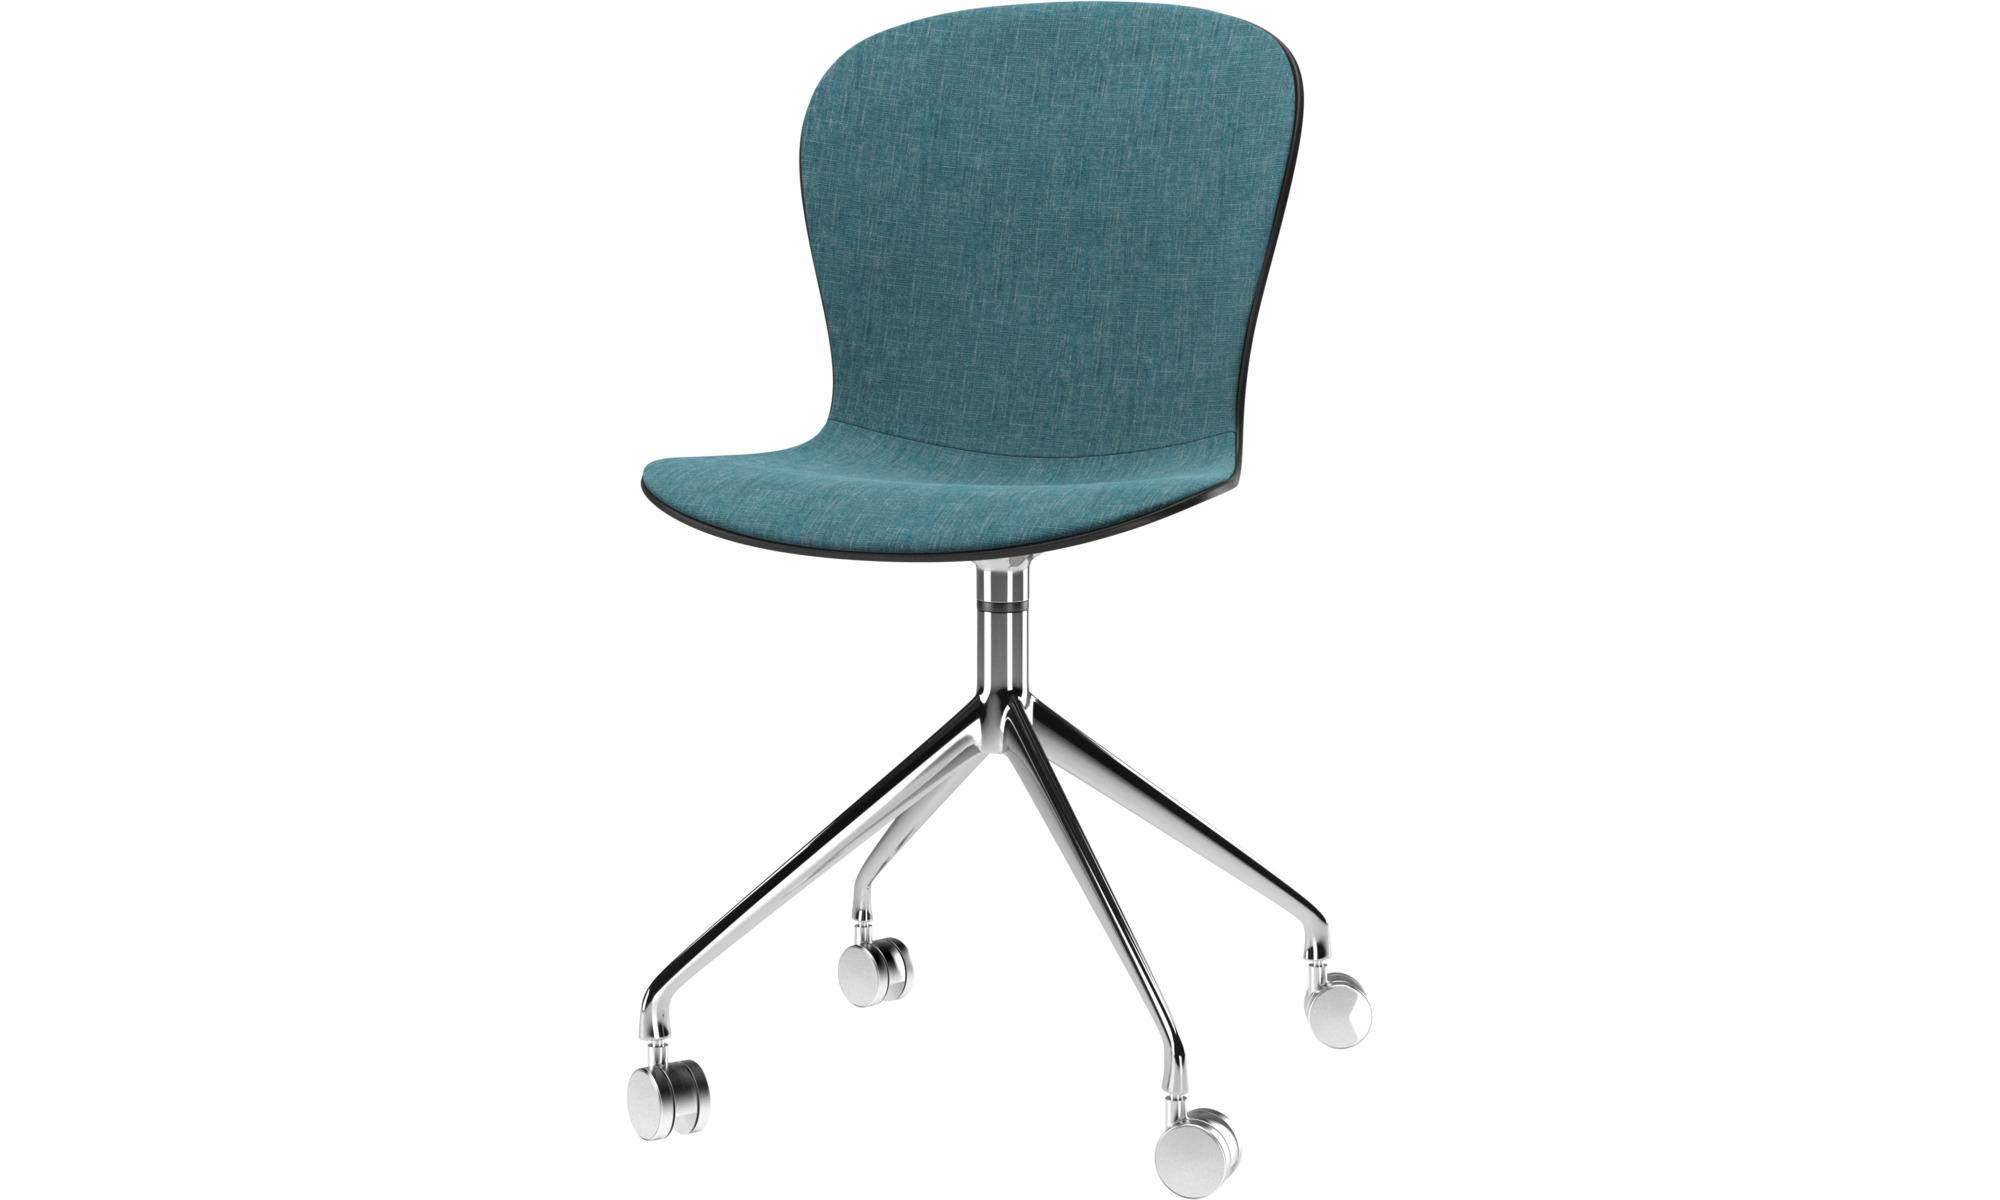 Chaises de salle manger chaise adelaide roulettes for Chaise pivotante